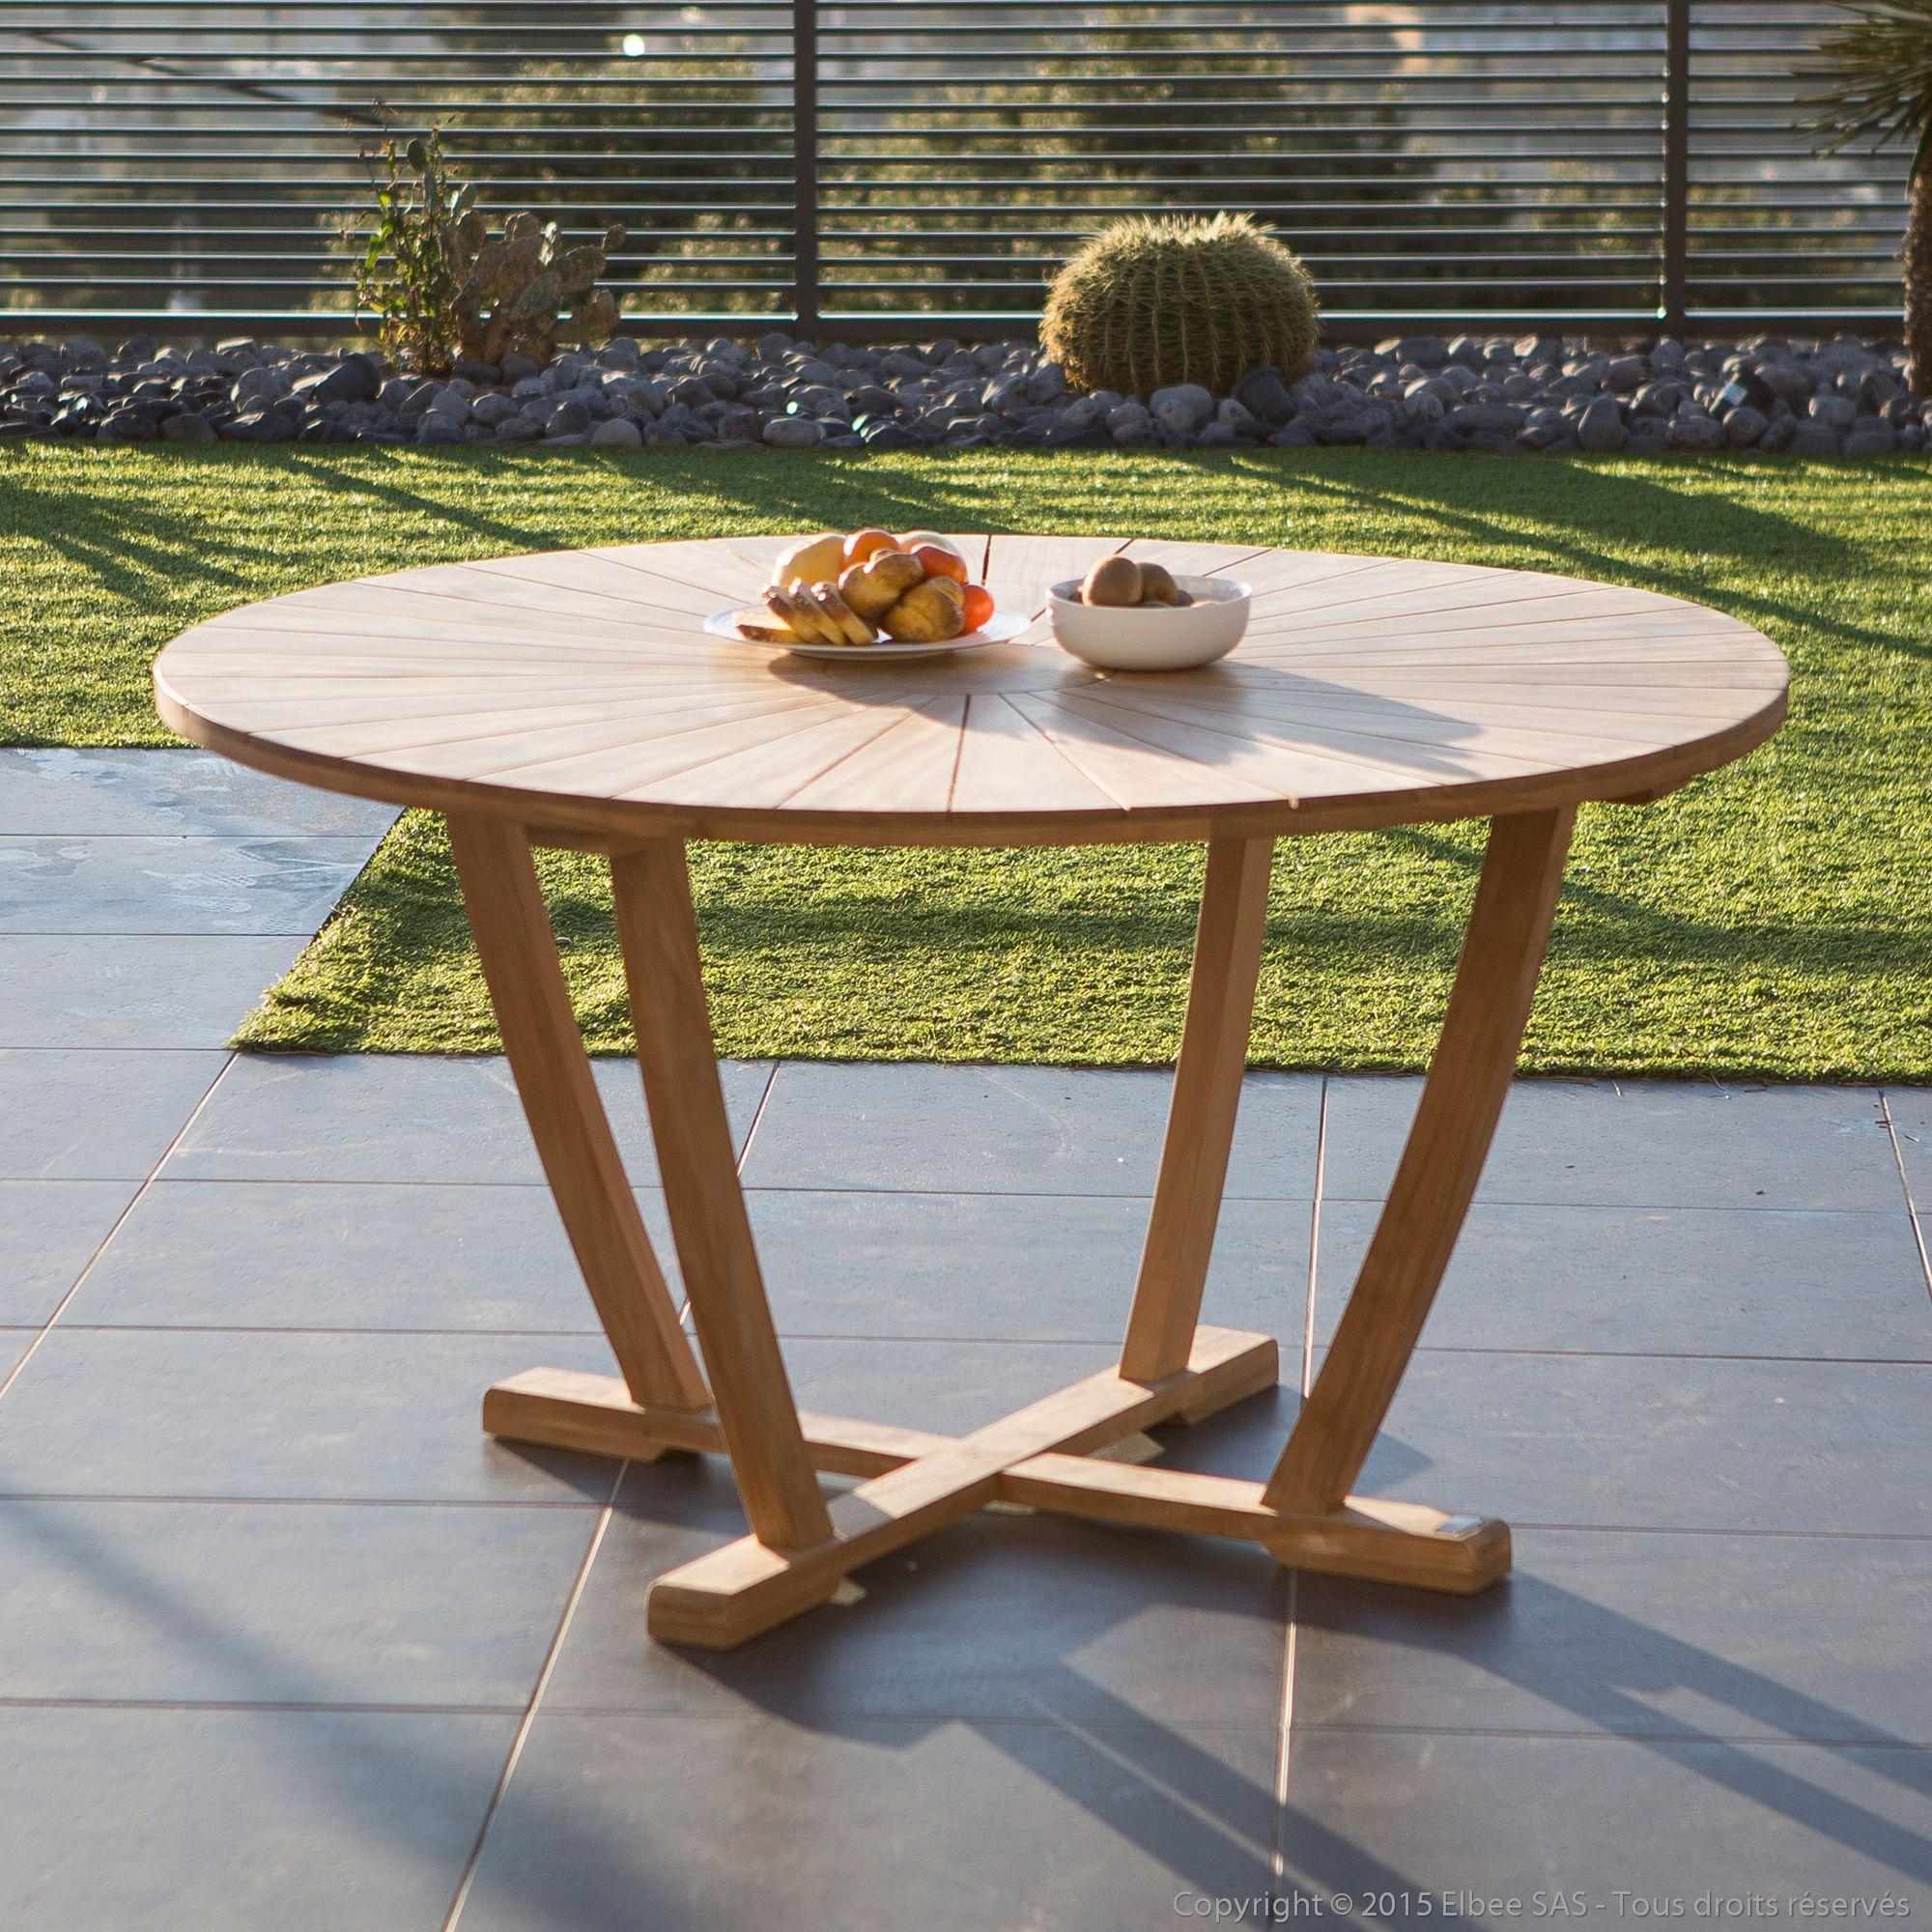 Table de jardin ronde en teck brut 140cm PALMA Ermanno G ...